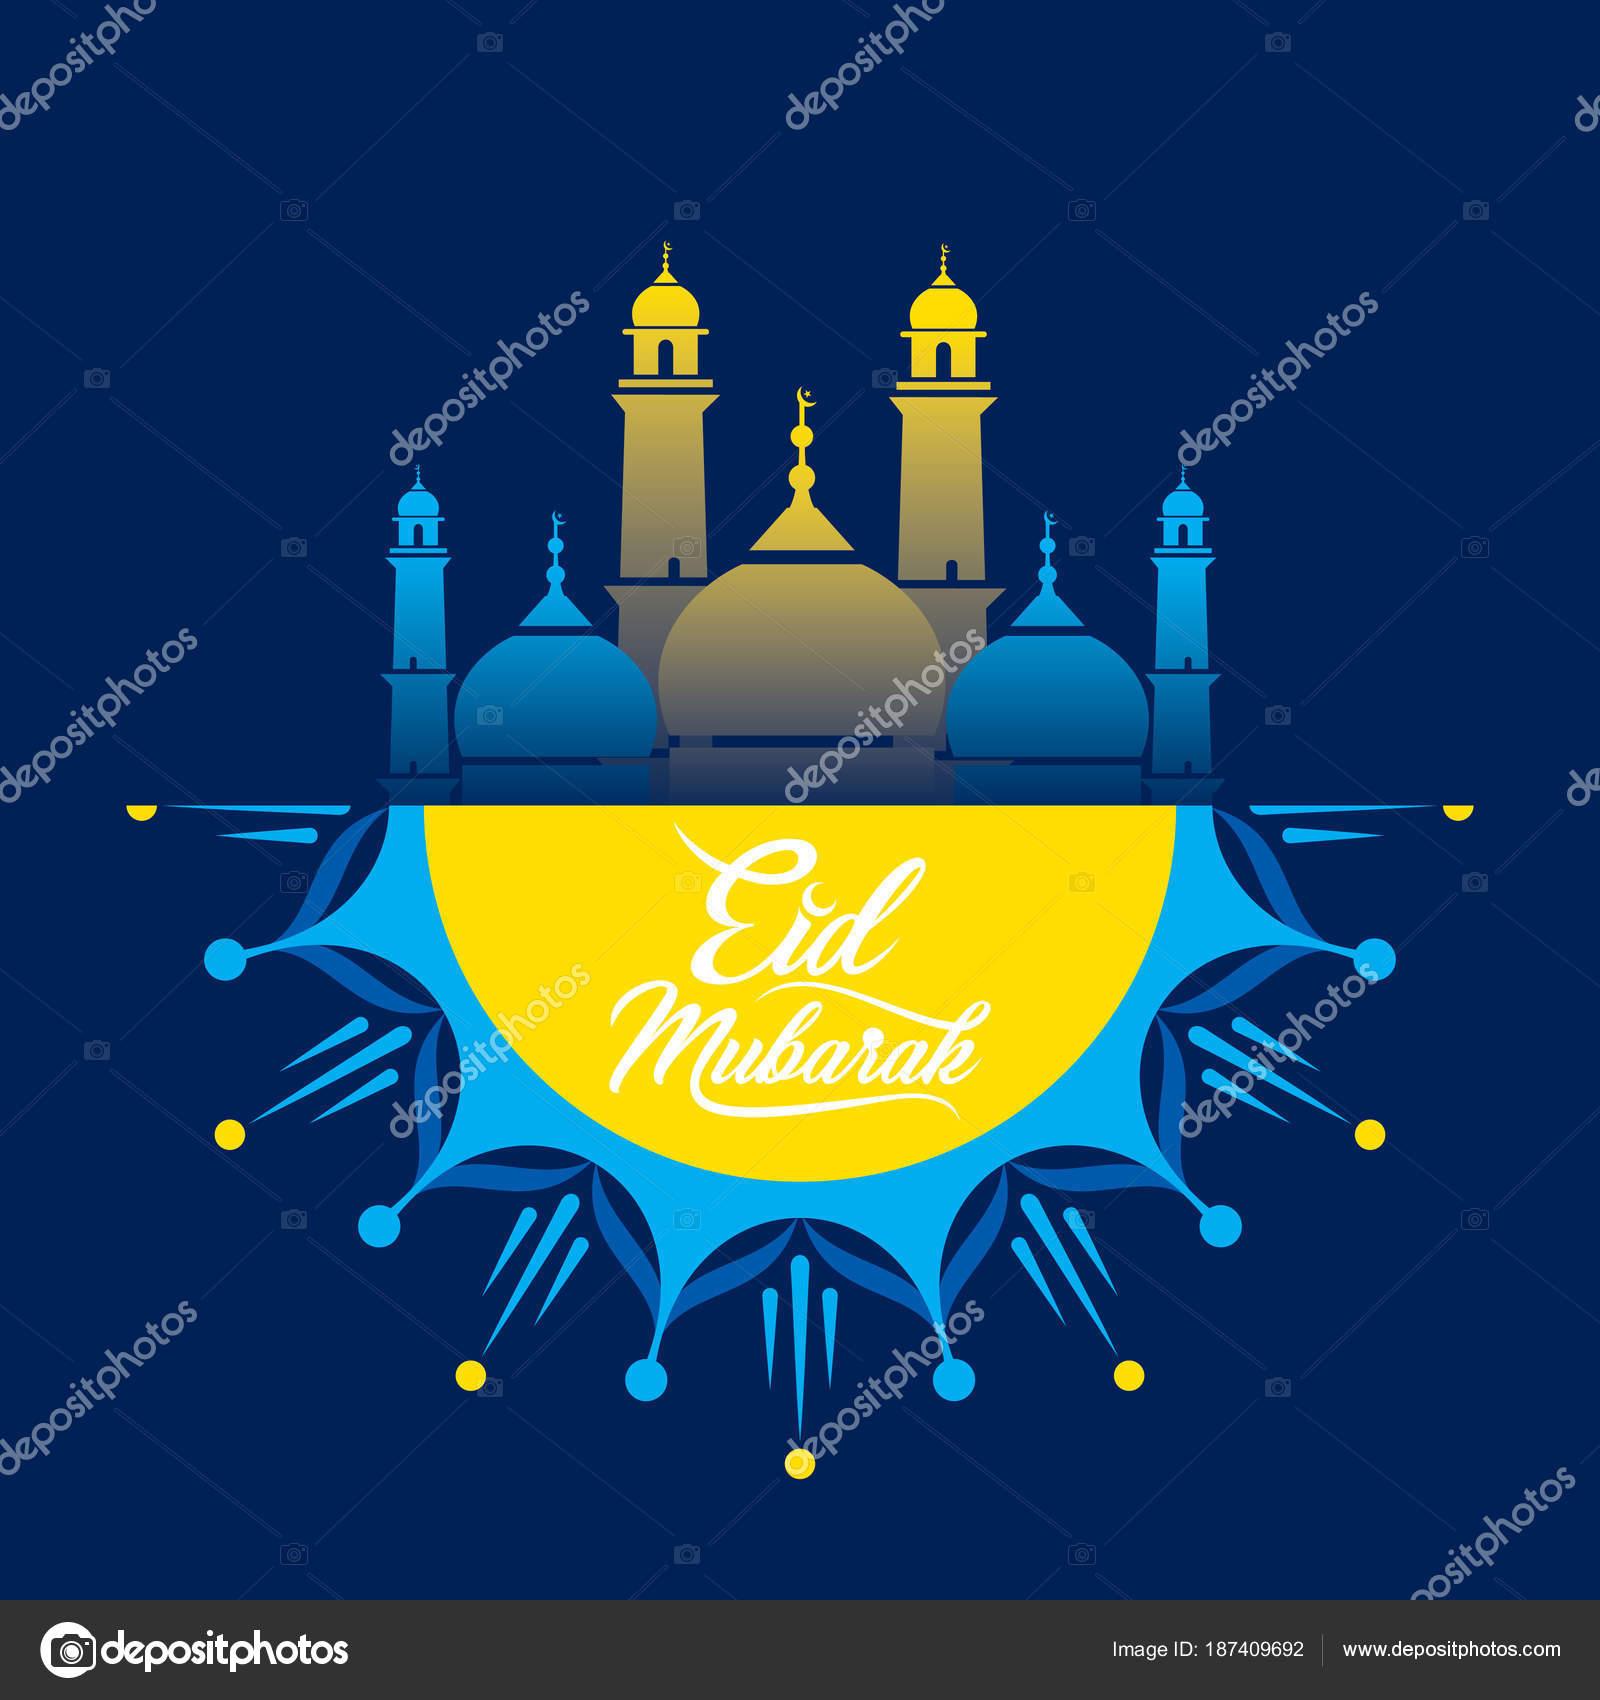 Cool Id Festival Eid Al-Fitr Greeting - depositphotos_187409692-stock-illustration-happy-eid-mubarak-greeting-design  Collection_15664 .jpg